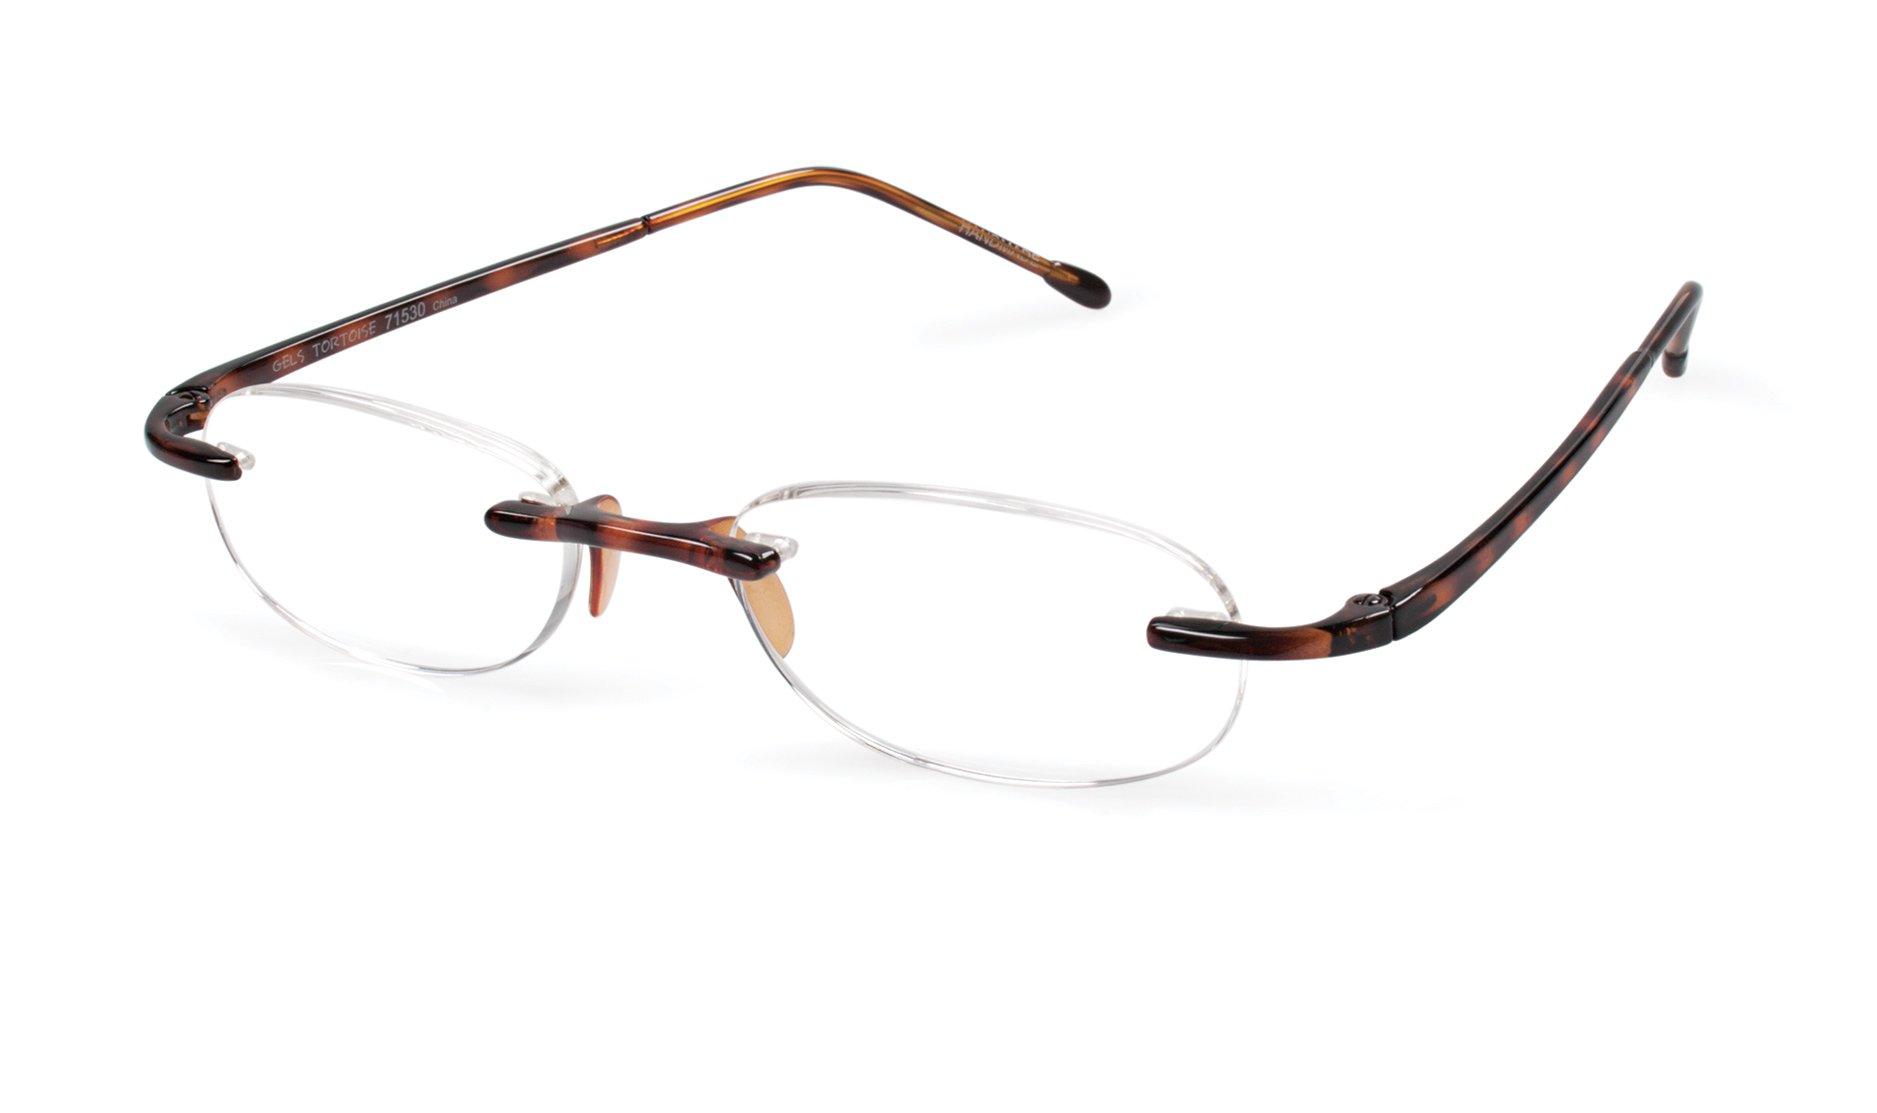 Scojo New York Gels The Original Reading Glasses - Tortoise (+1.00 Magnification Power)